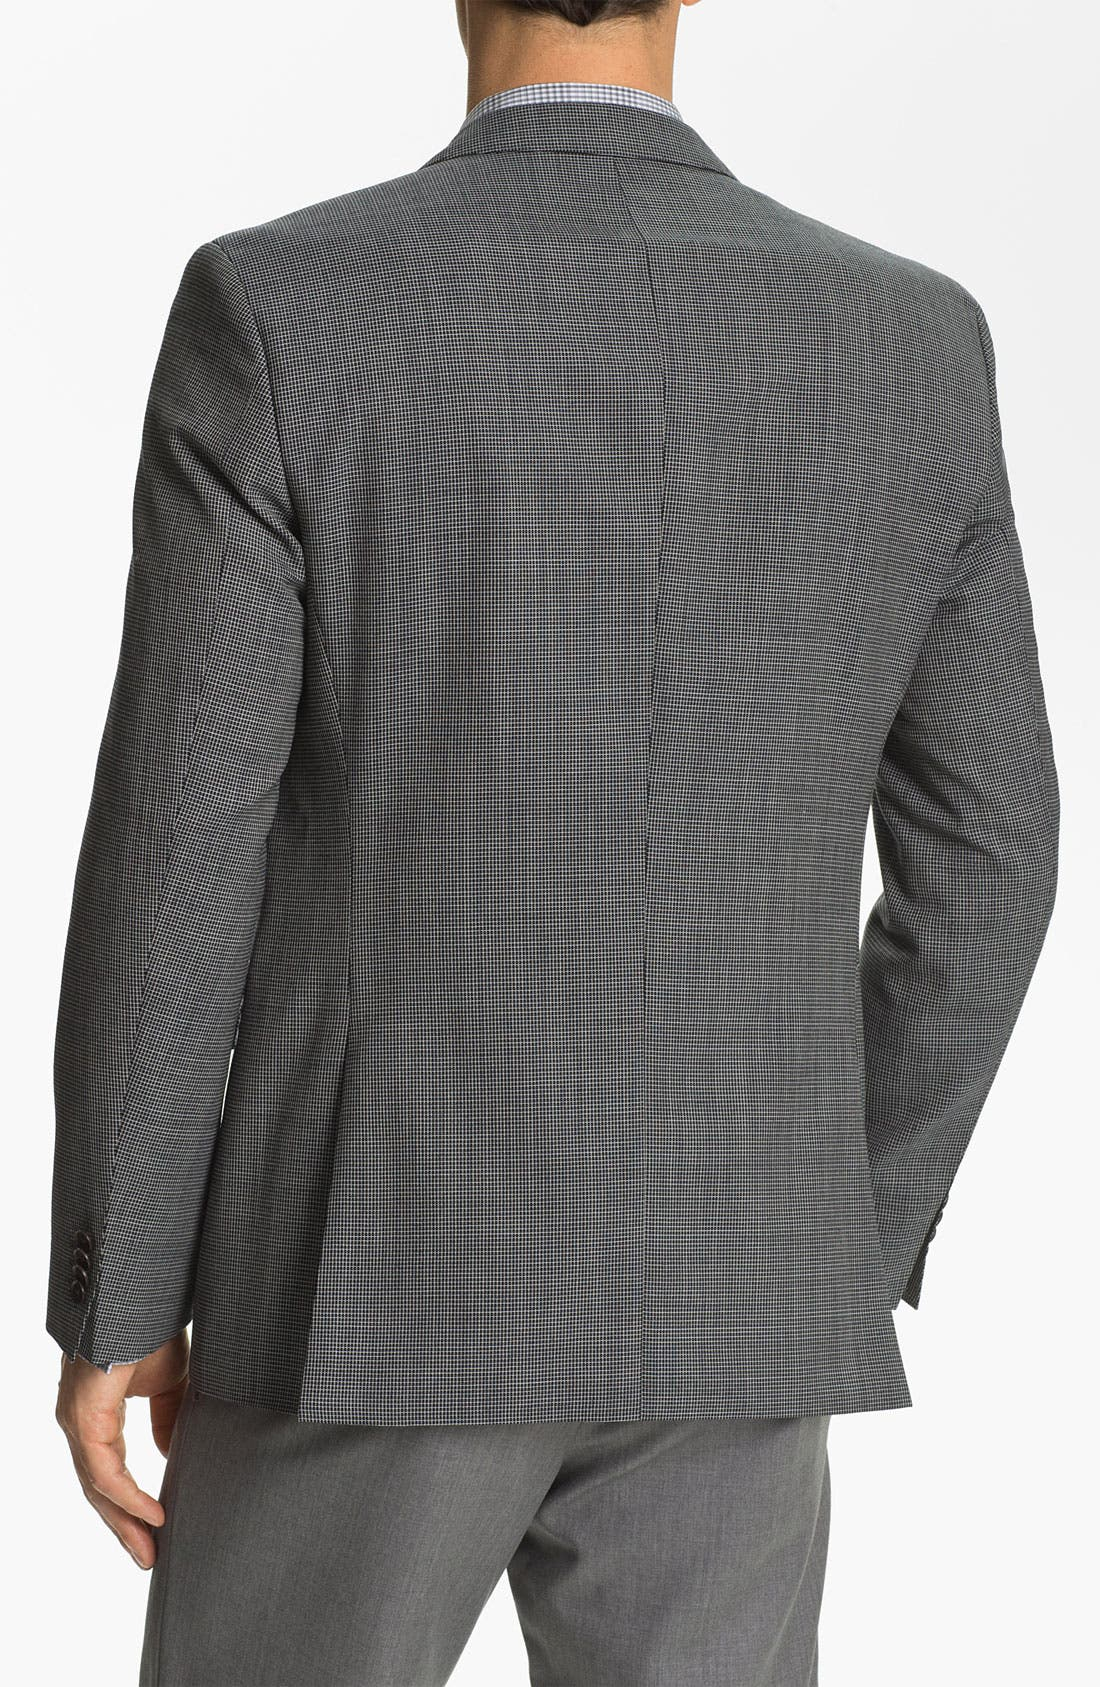 Alternate Image 2  - BOSS Black 'Keys' Trim Fit Check Sportcoat